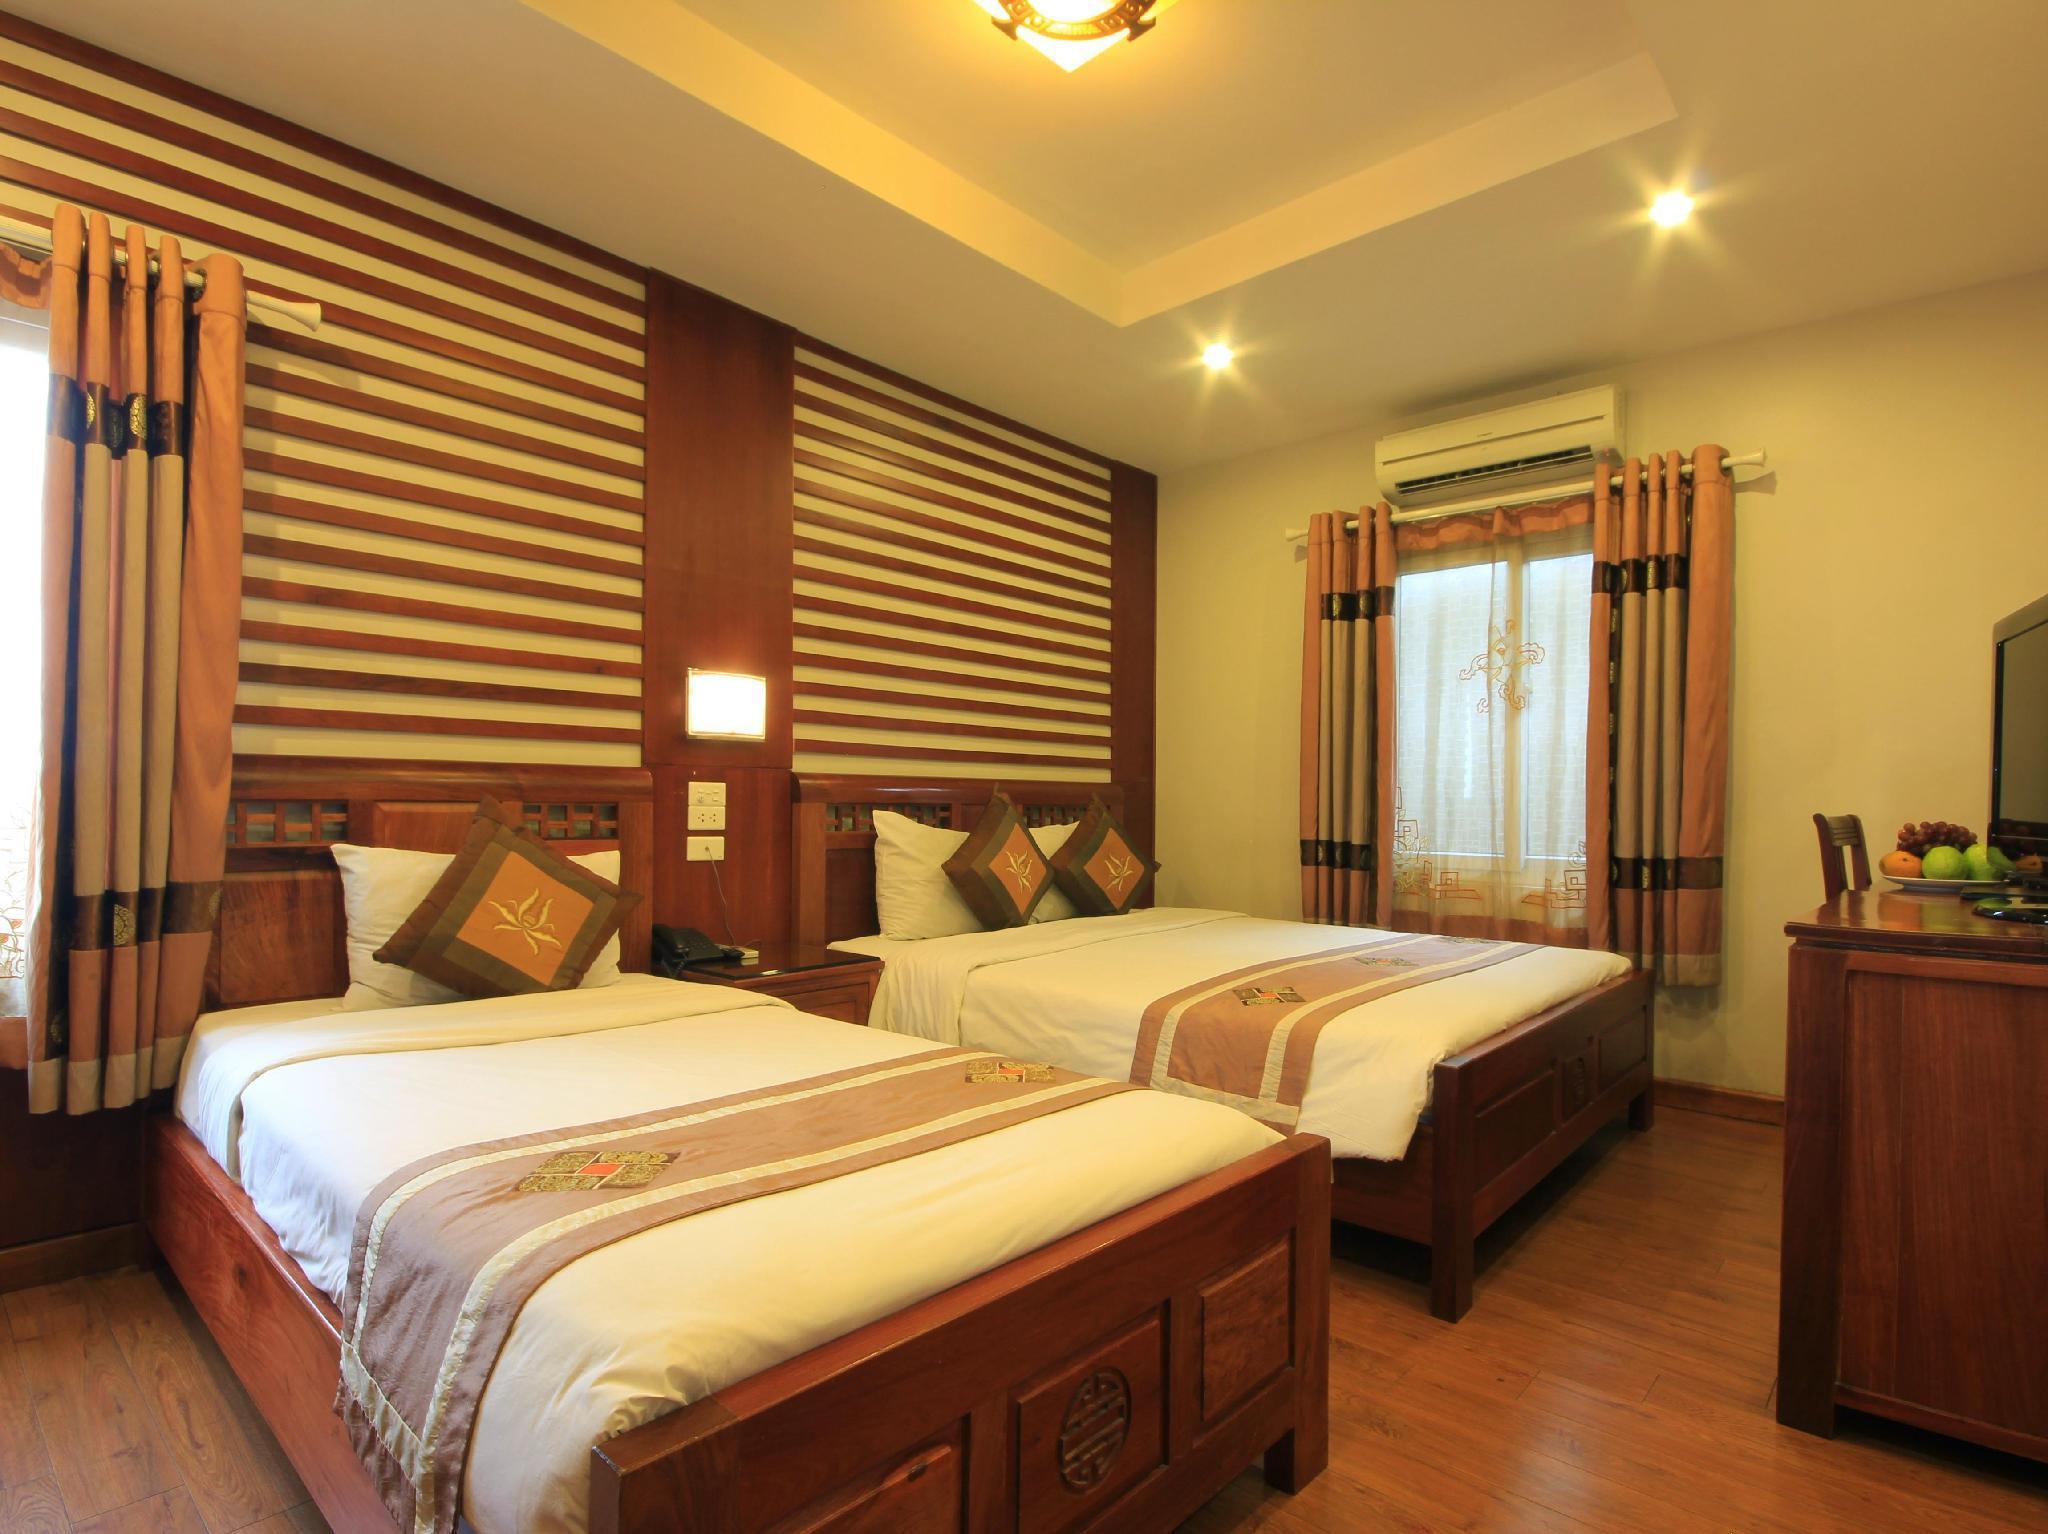 Icon 36 Hotel & Residence, Hoàn Kiếm